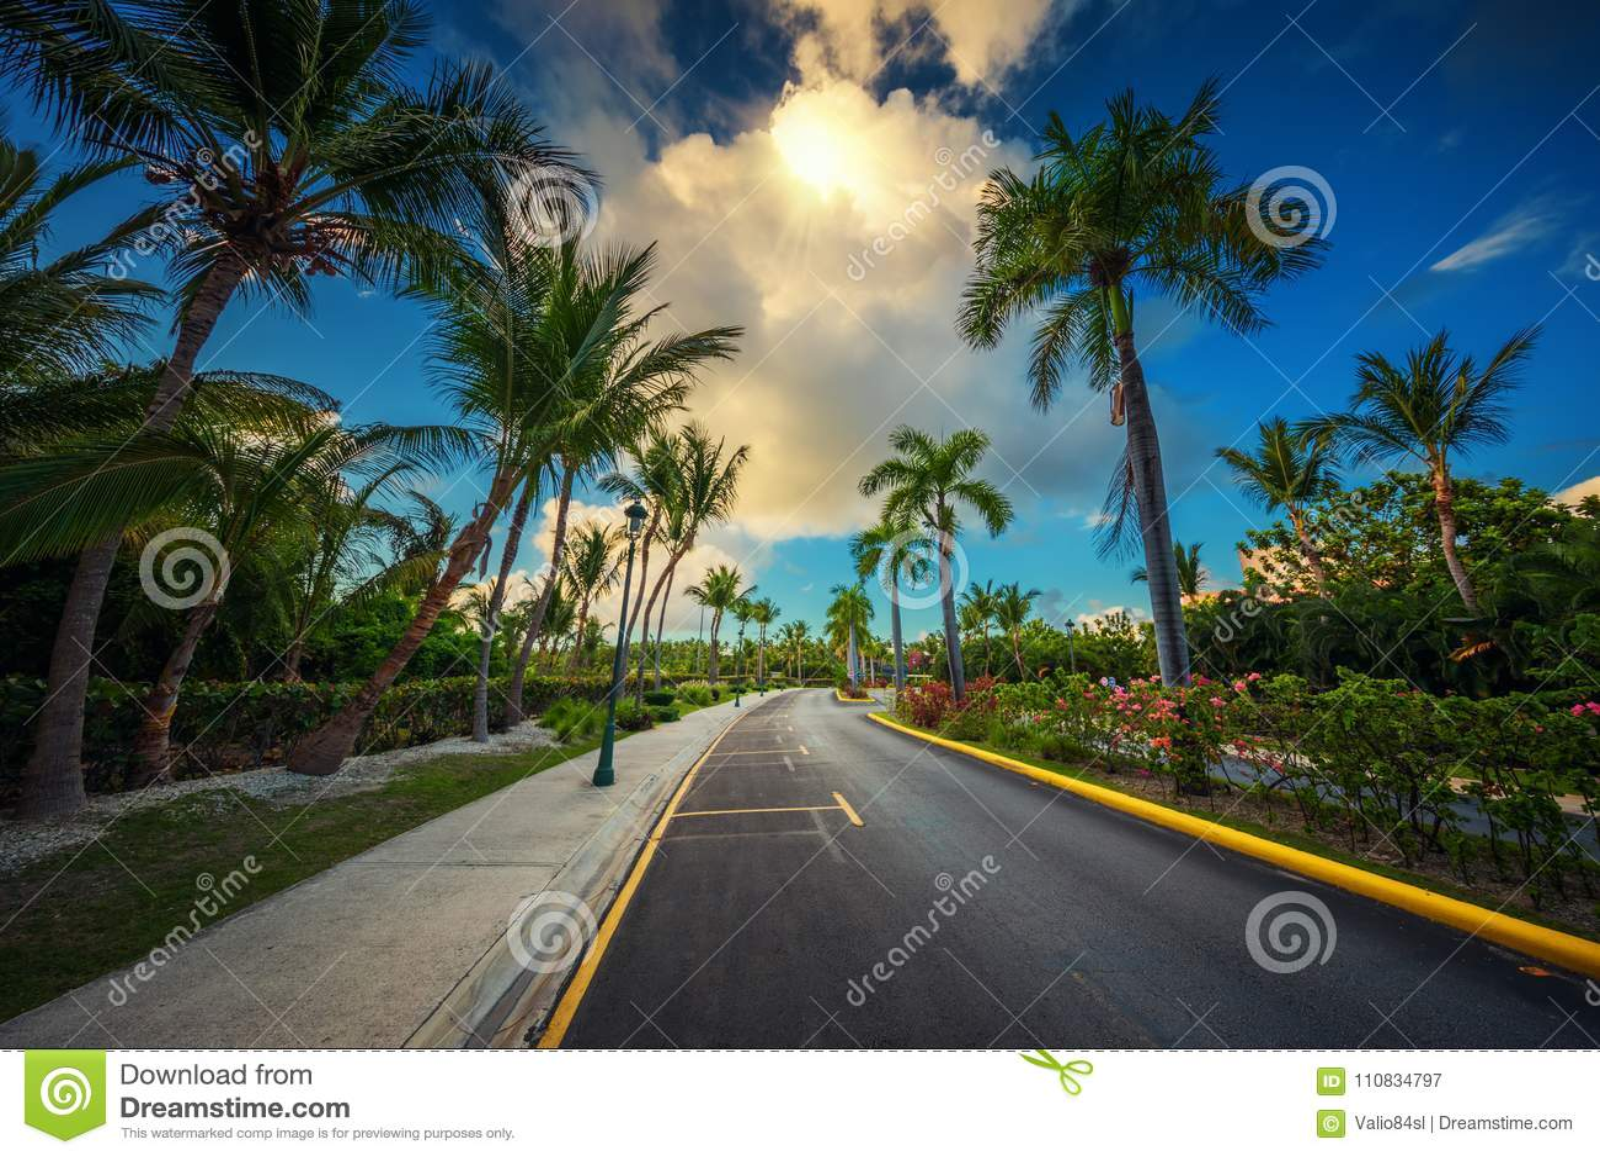 Tropical garden and pathway toward luxury resort in Punta Cana,